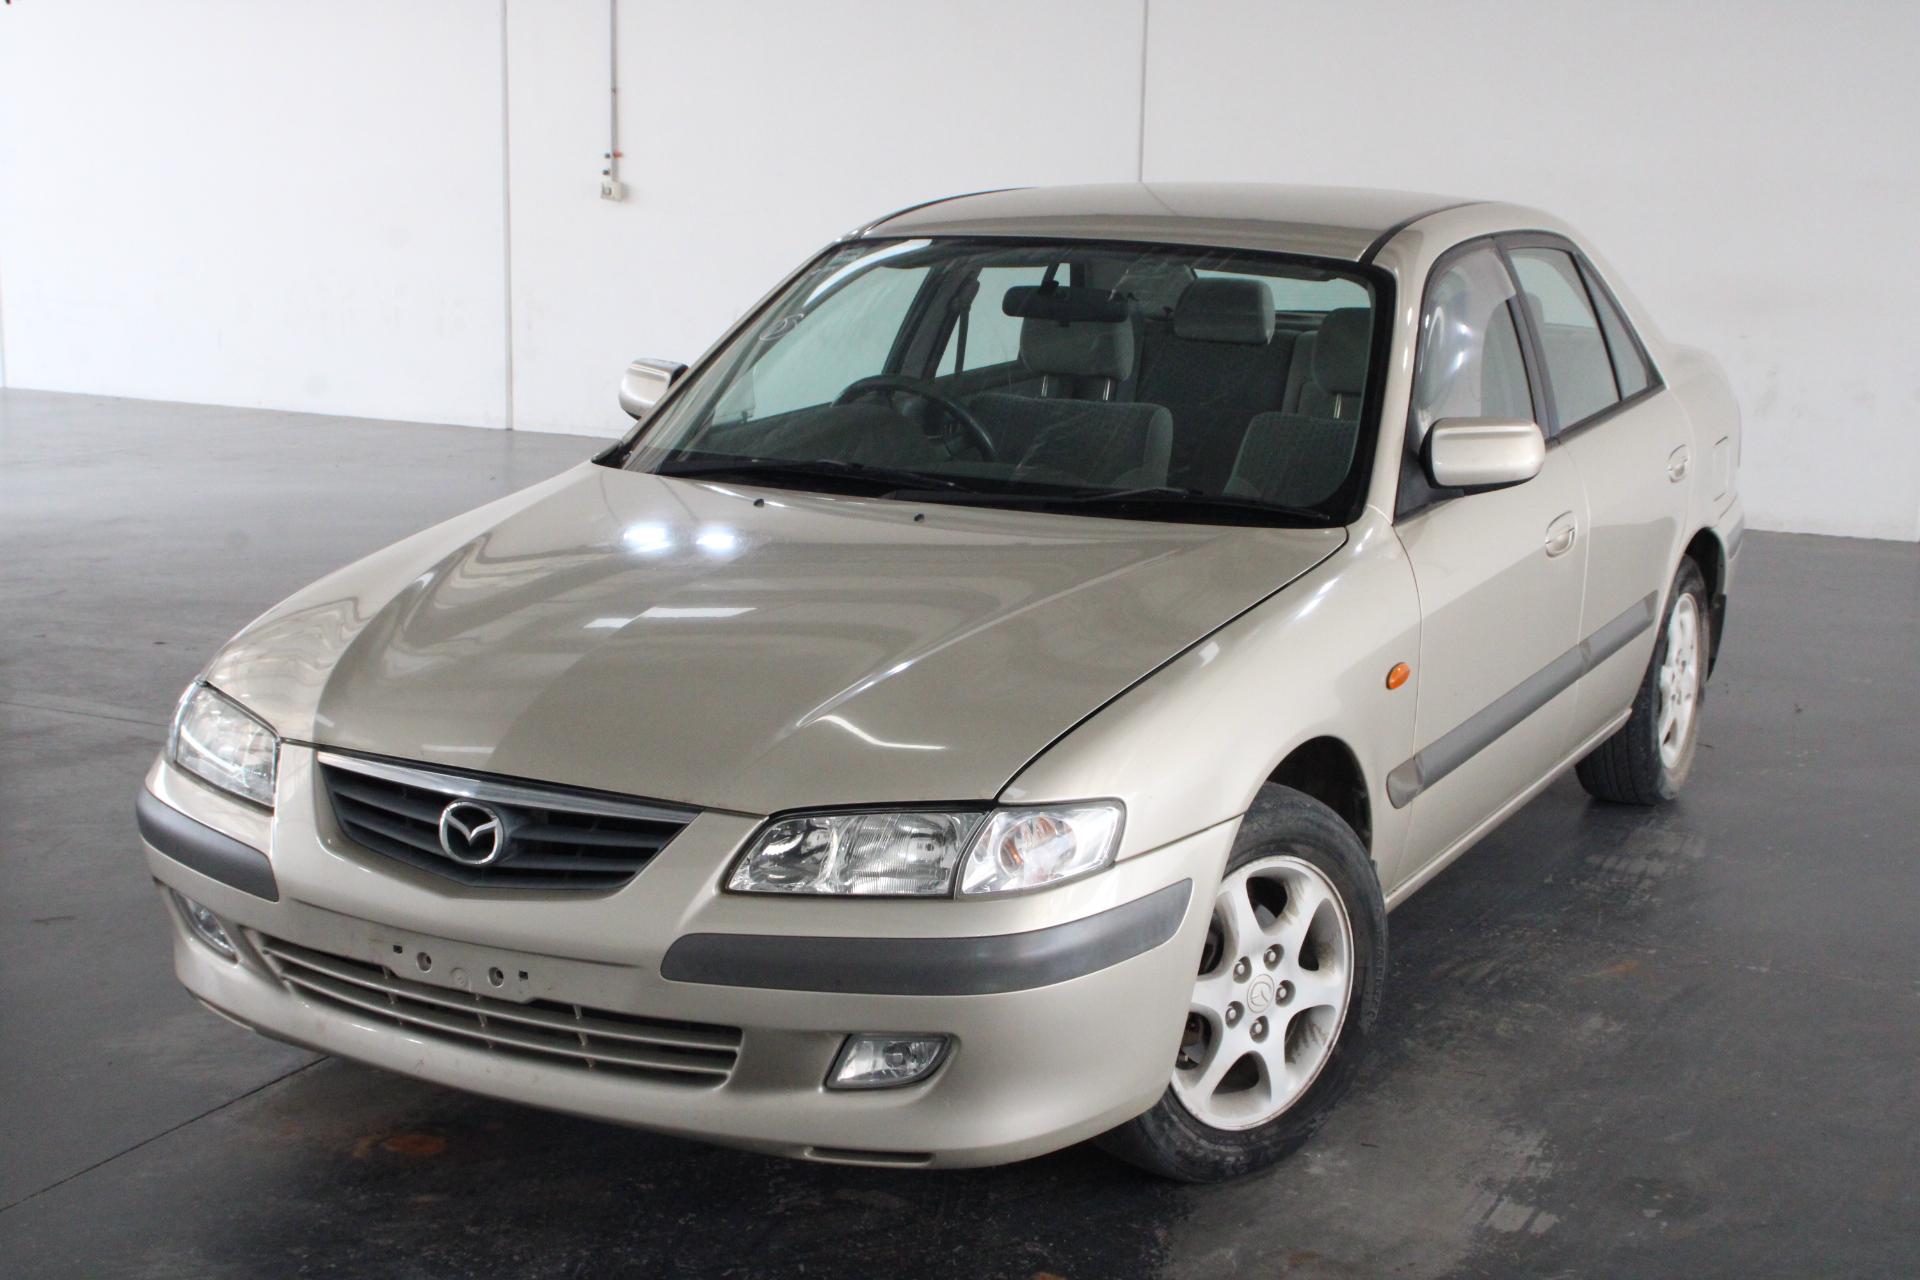 2000 Mazda 626 Classic GF Automatic Sedan